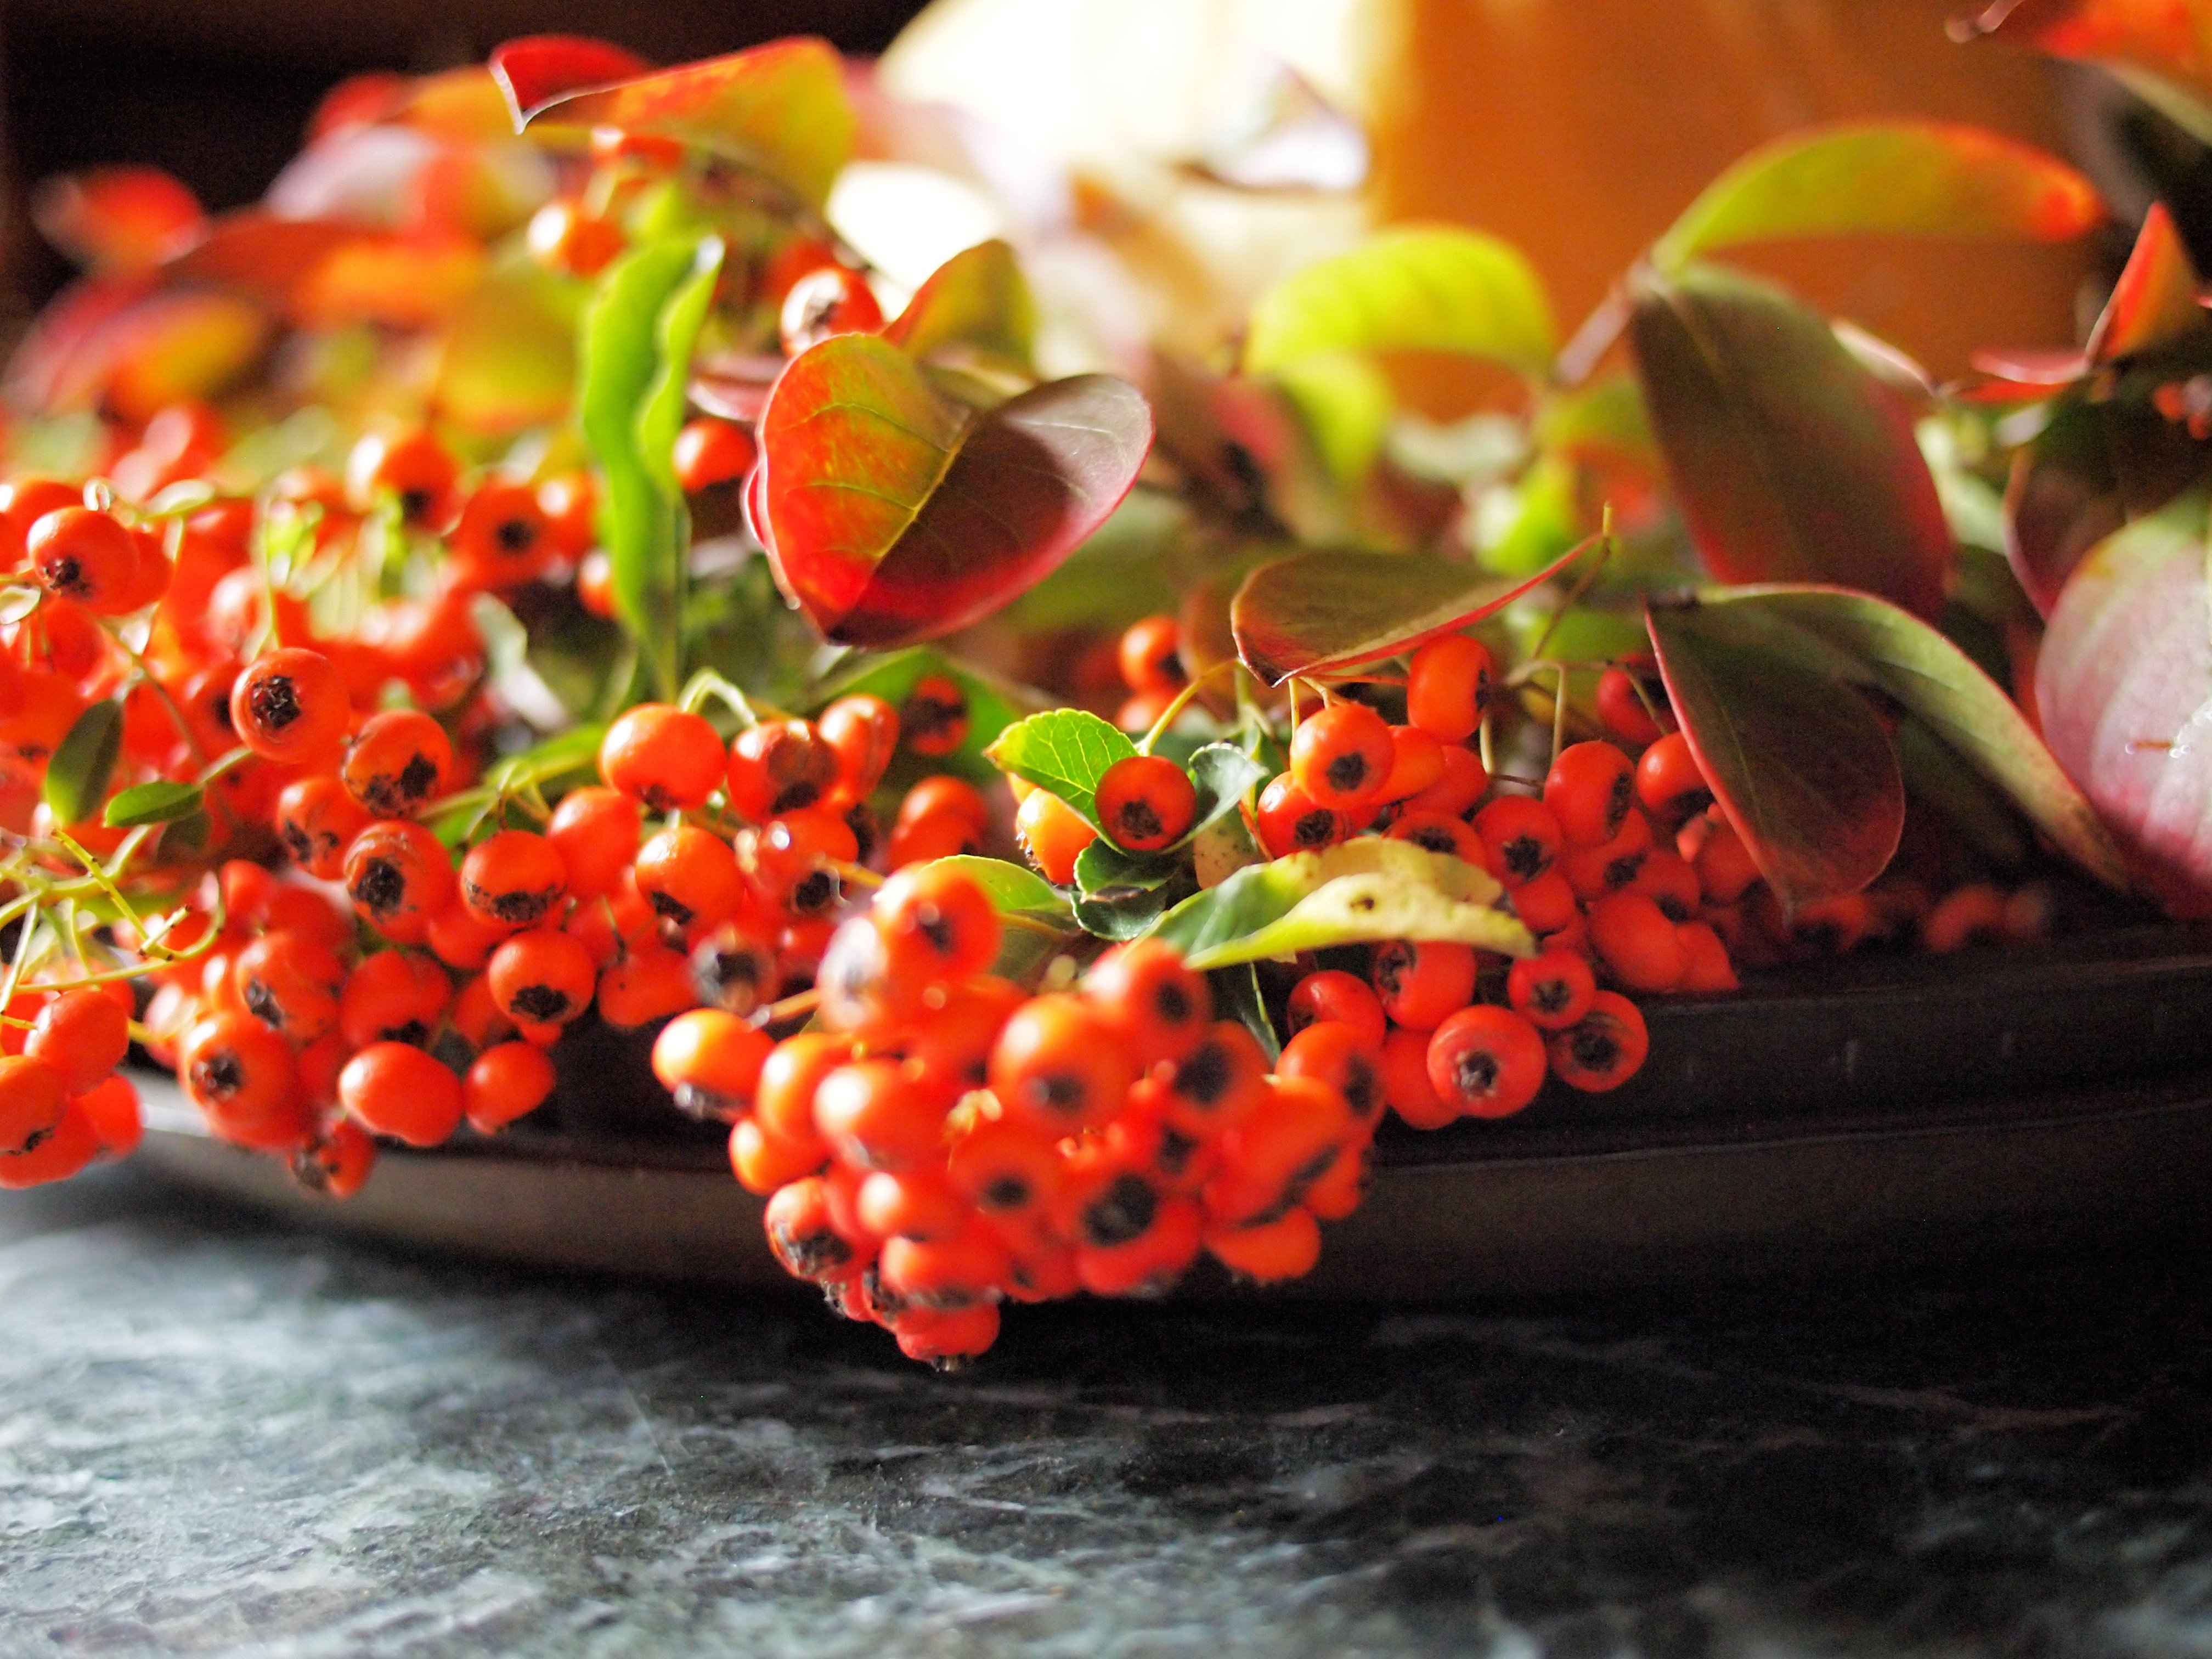 Autumn In Still Life Bringing The Autumn Garden Into Your